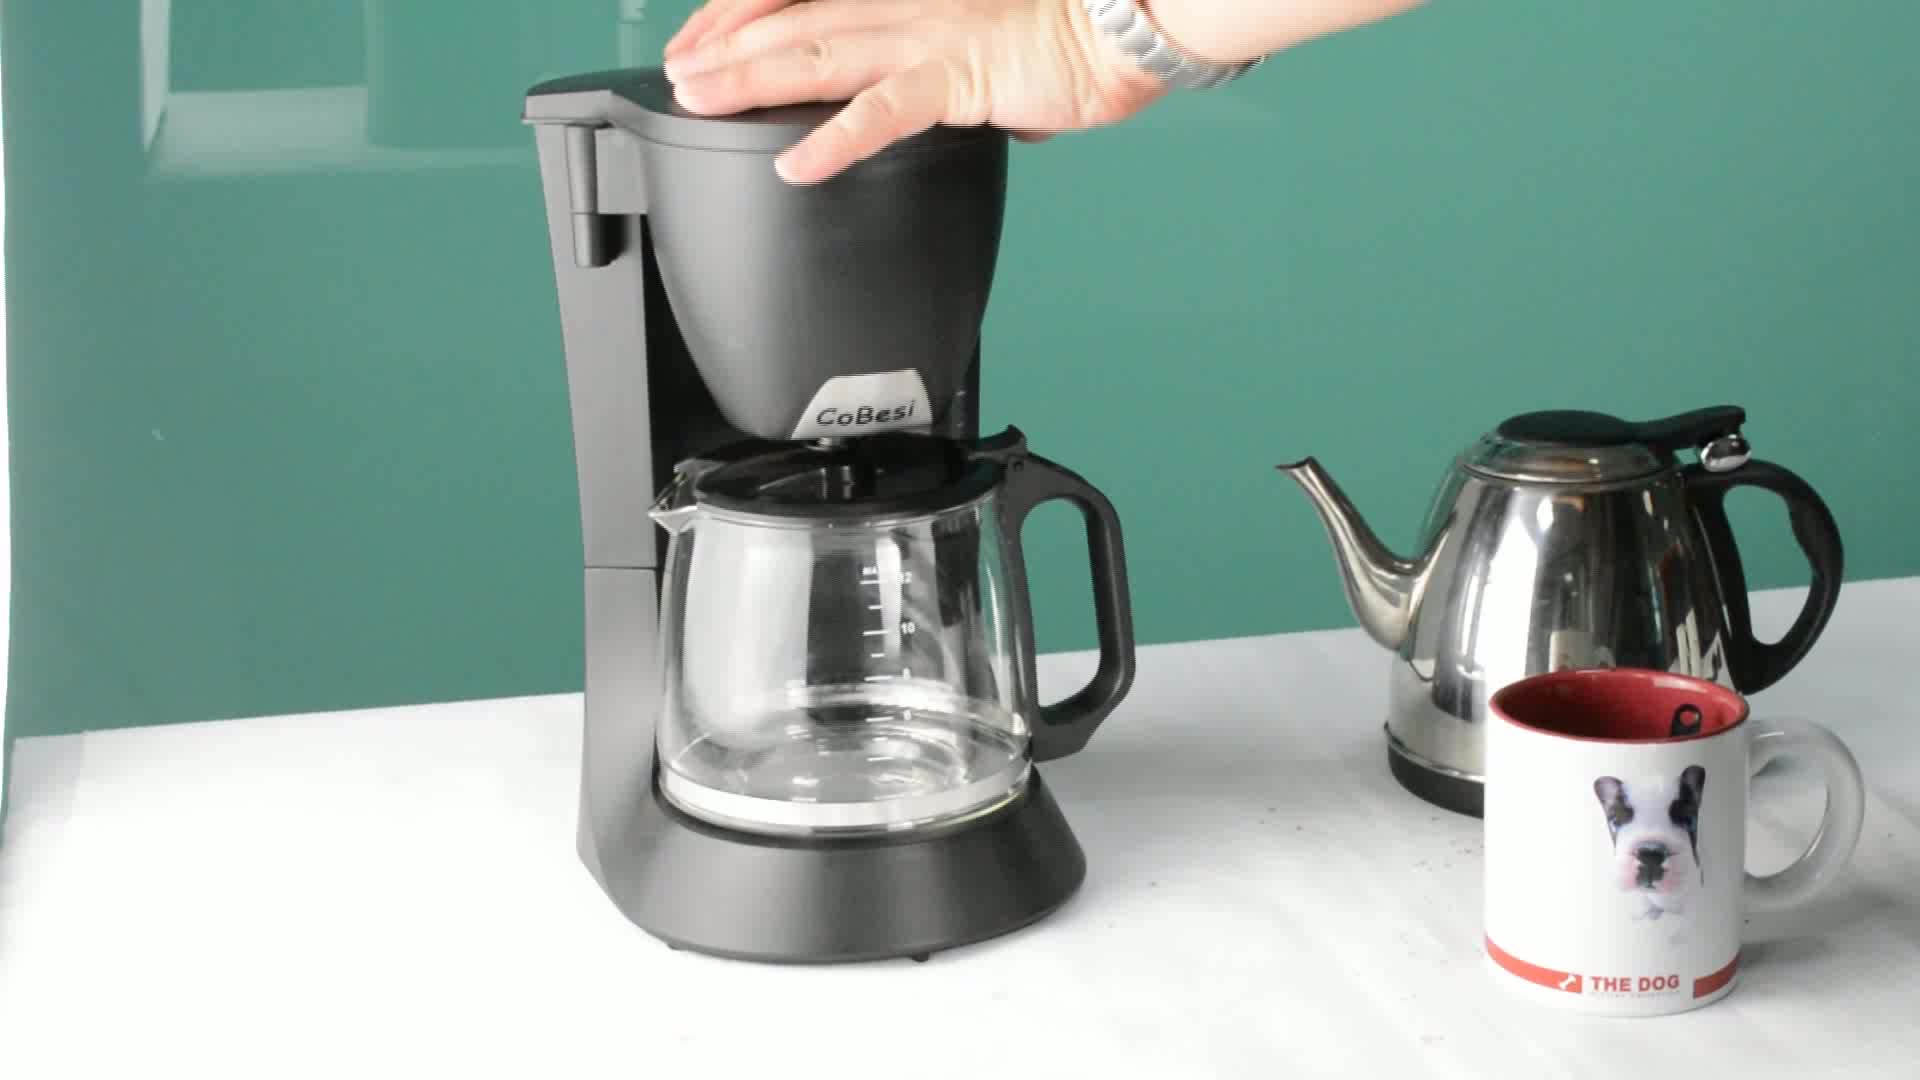 Cheapest Anti Drip Keep Warming Drip Coffee Maker Buy